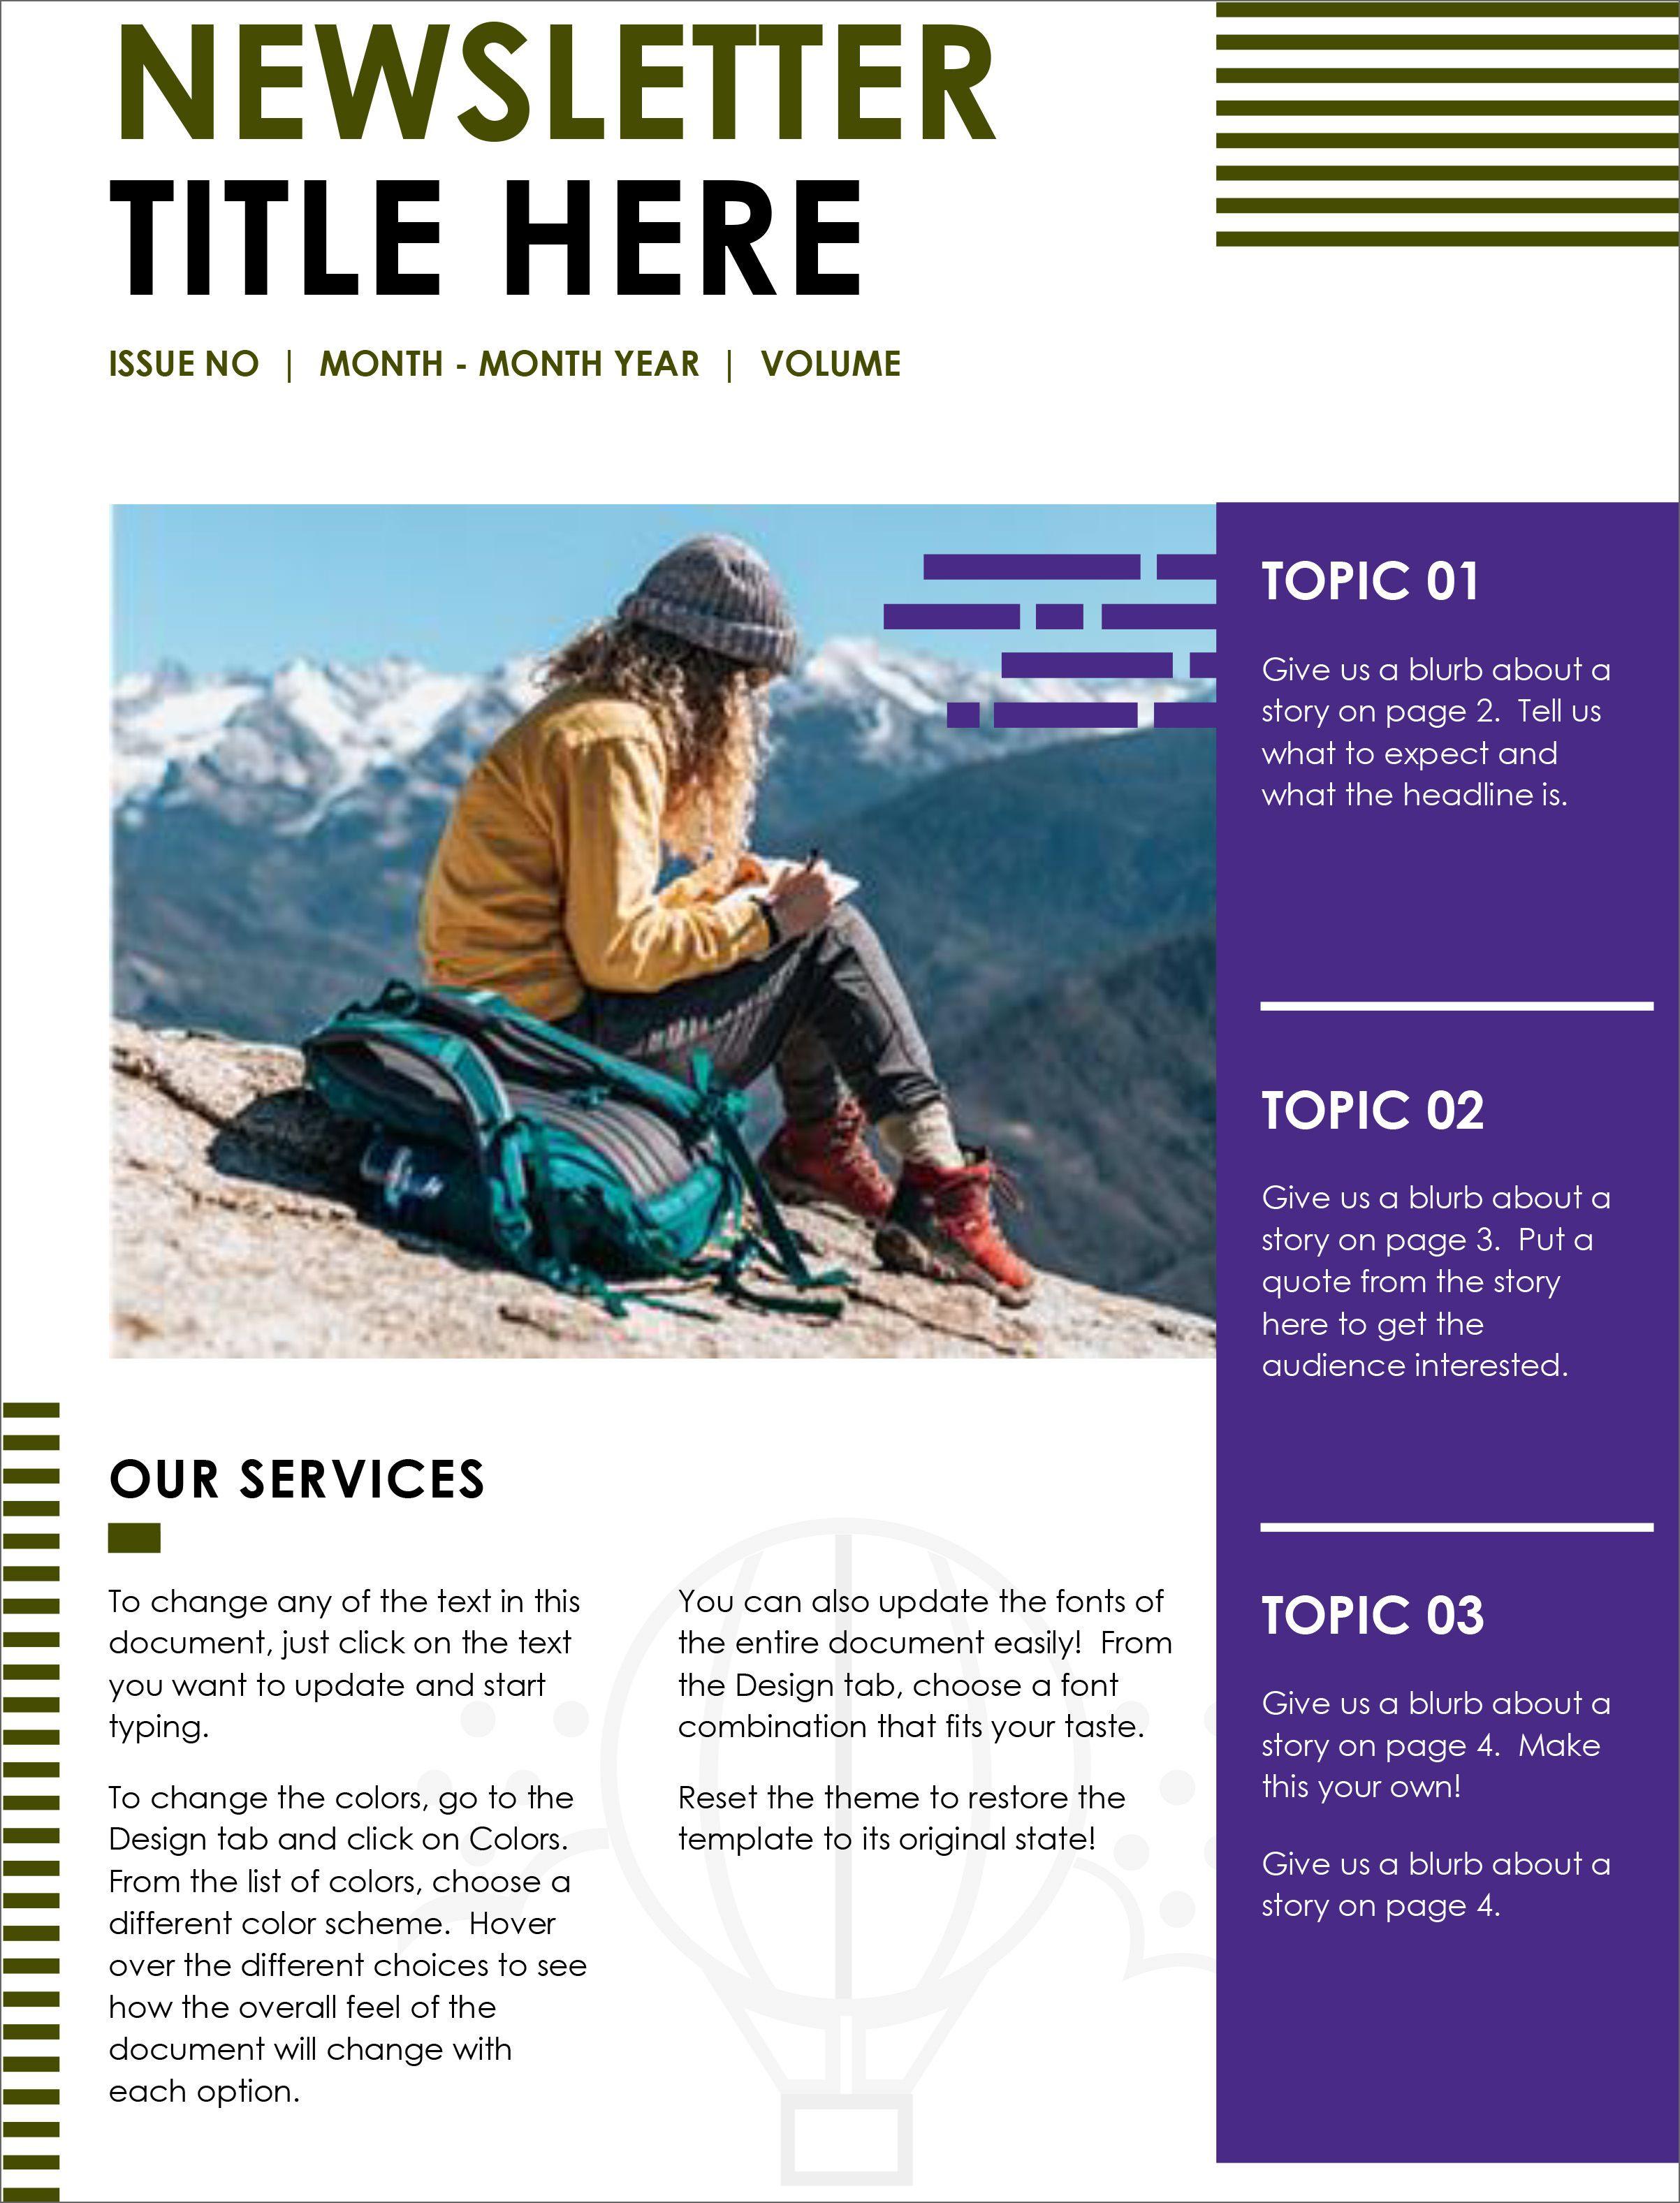 003 Impressive High School Newsletter Template Free Download Inspiration Full